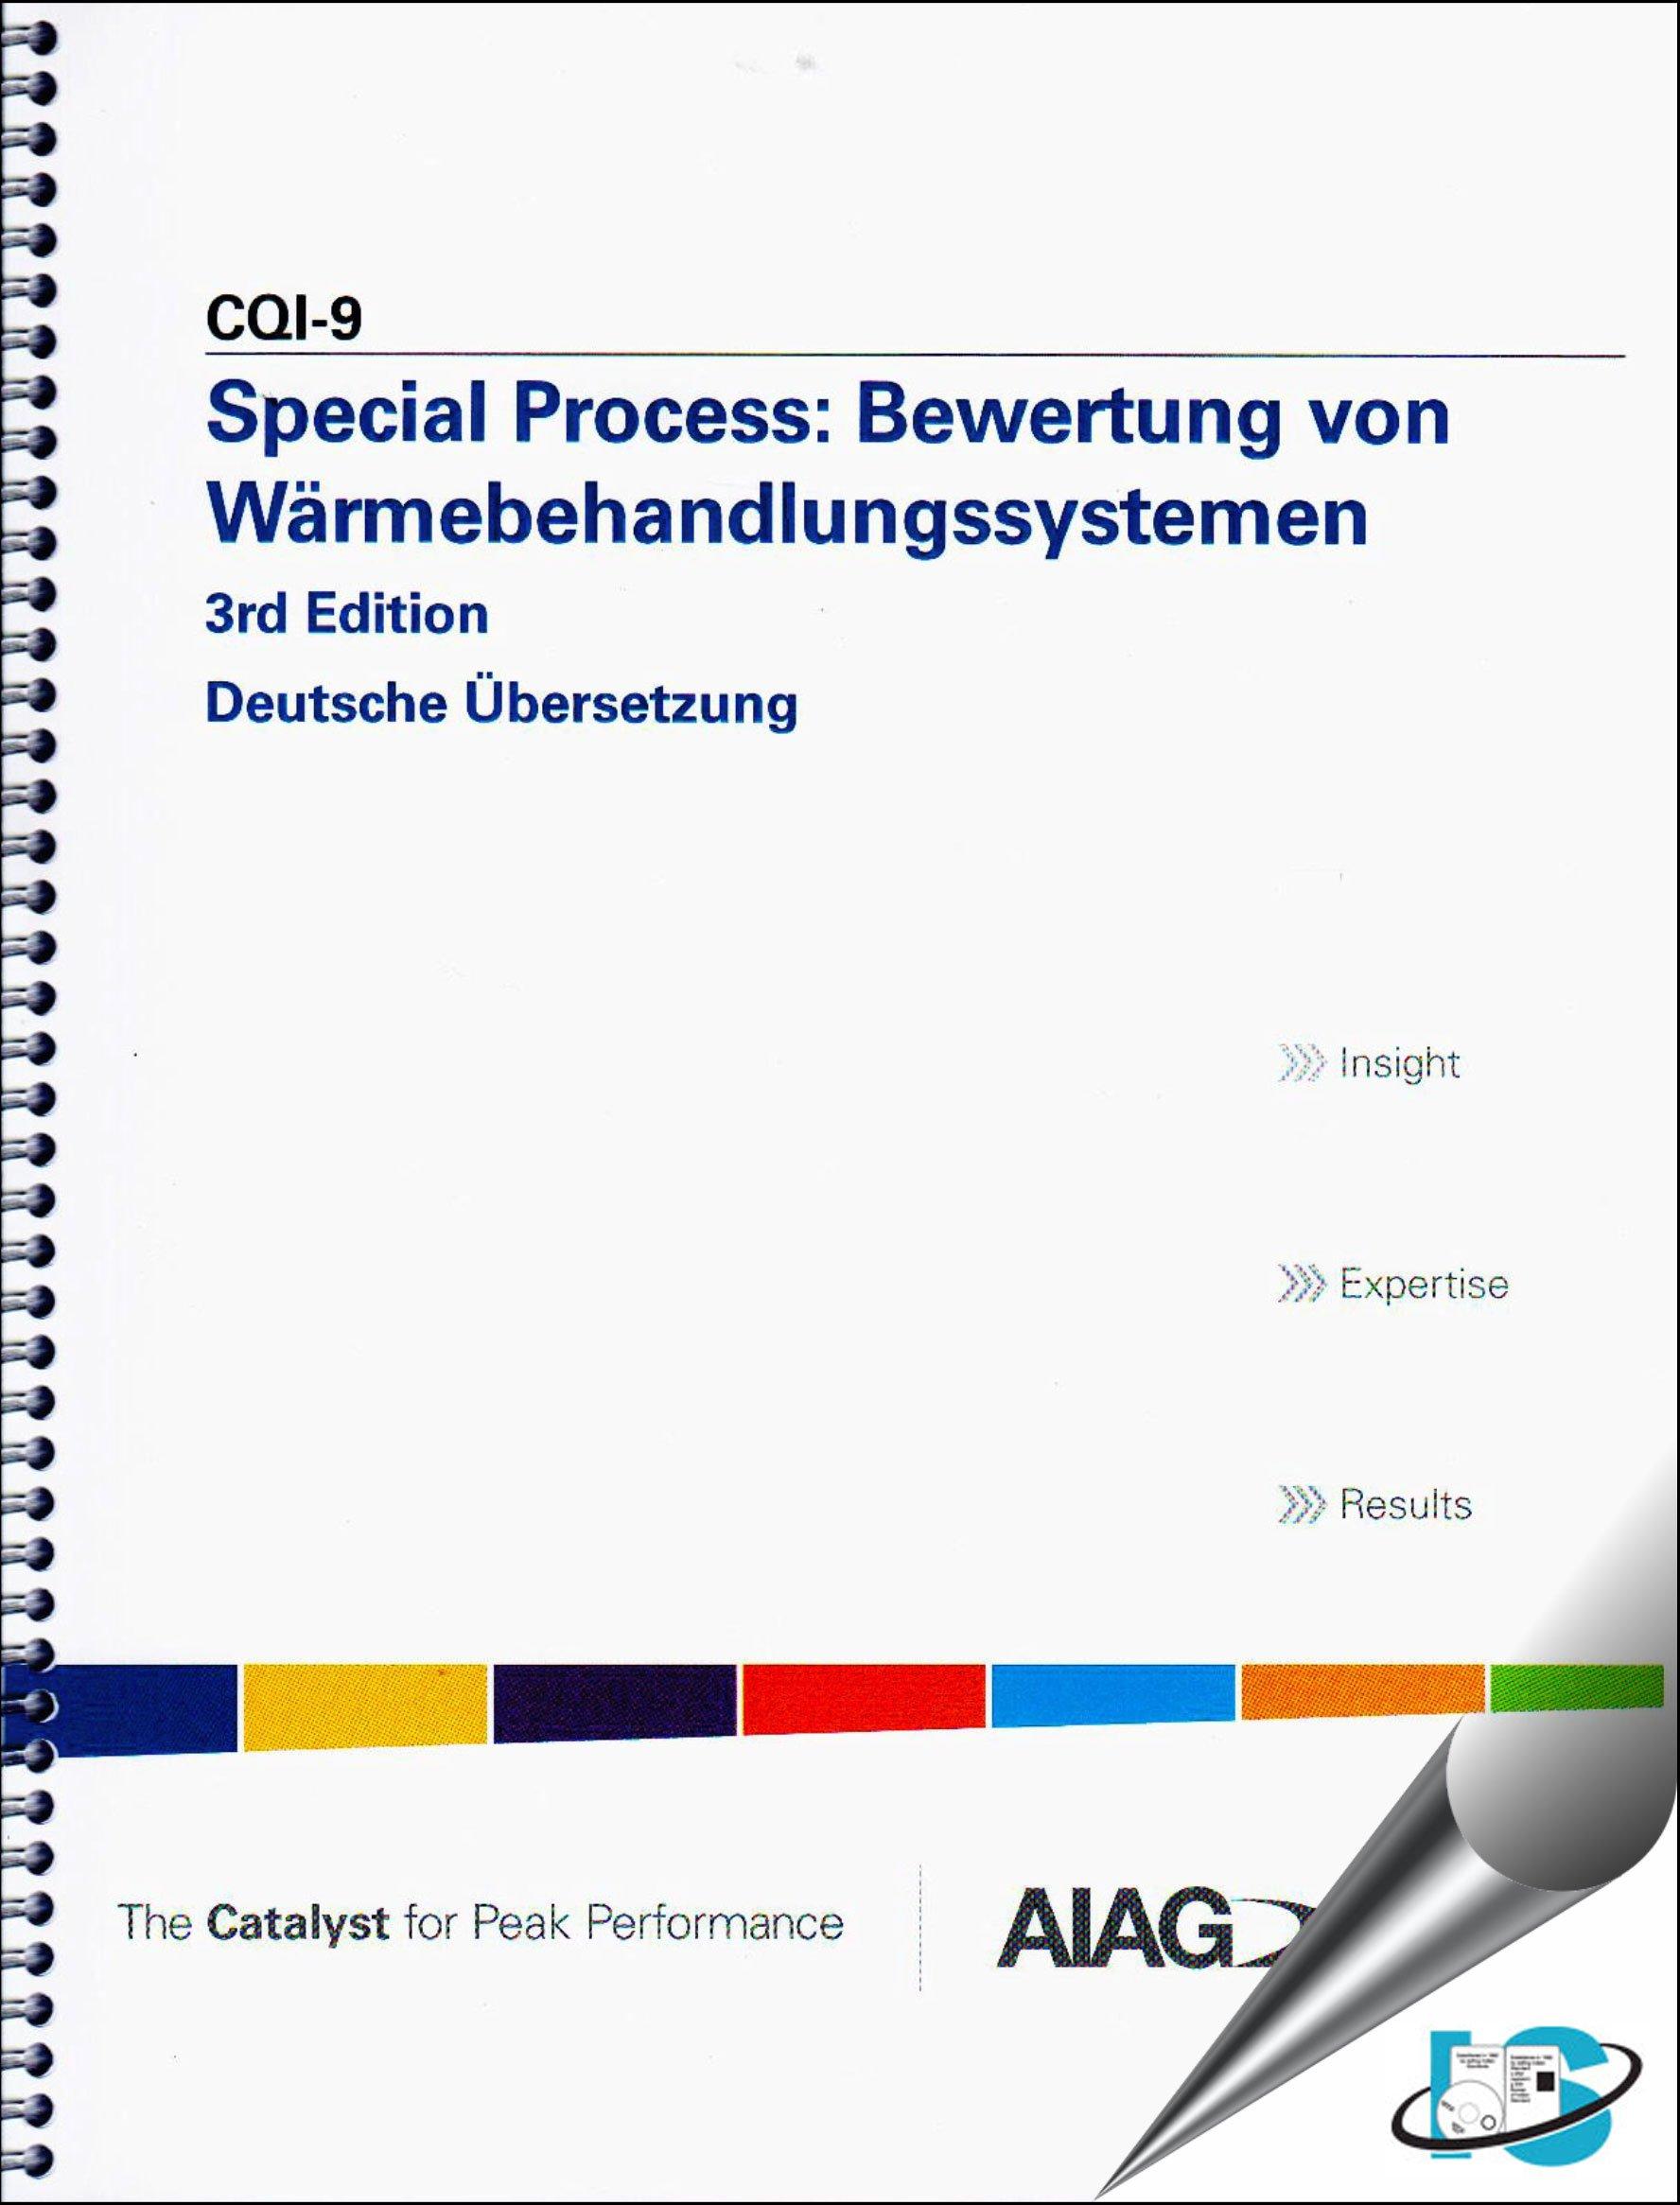 Cqi 9 3rd edition errata sheet   heat treating   thermocouple.